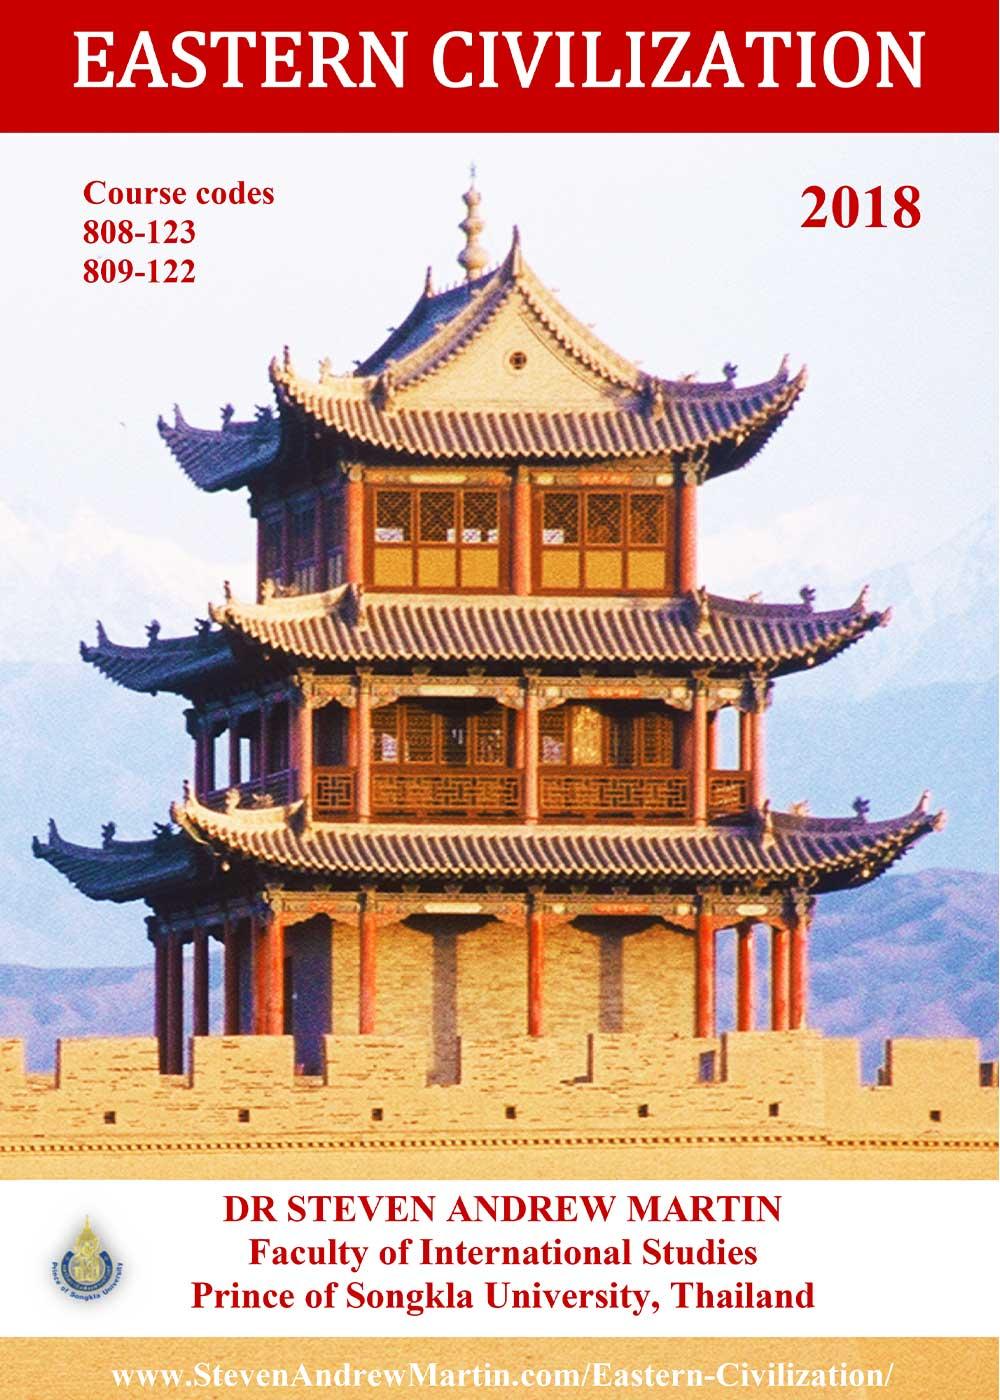 Eastern Civilization Textbook Cover | Asst Prof Dr Steven A Martin | Faculty of International Studies